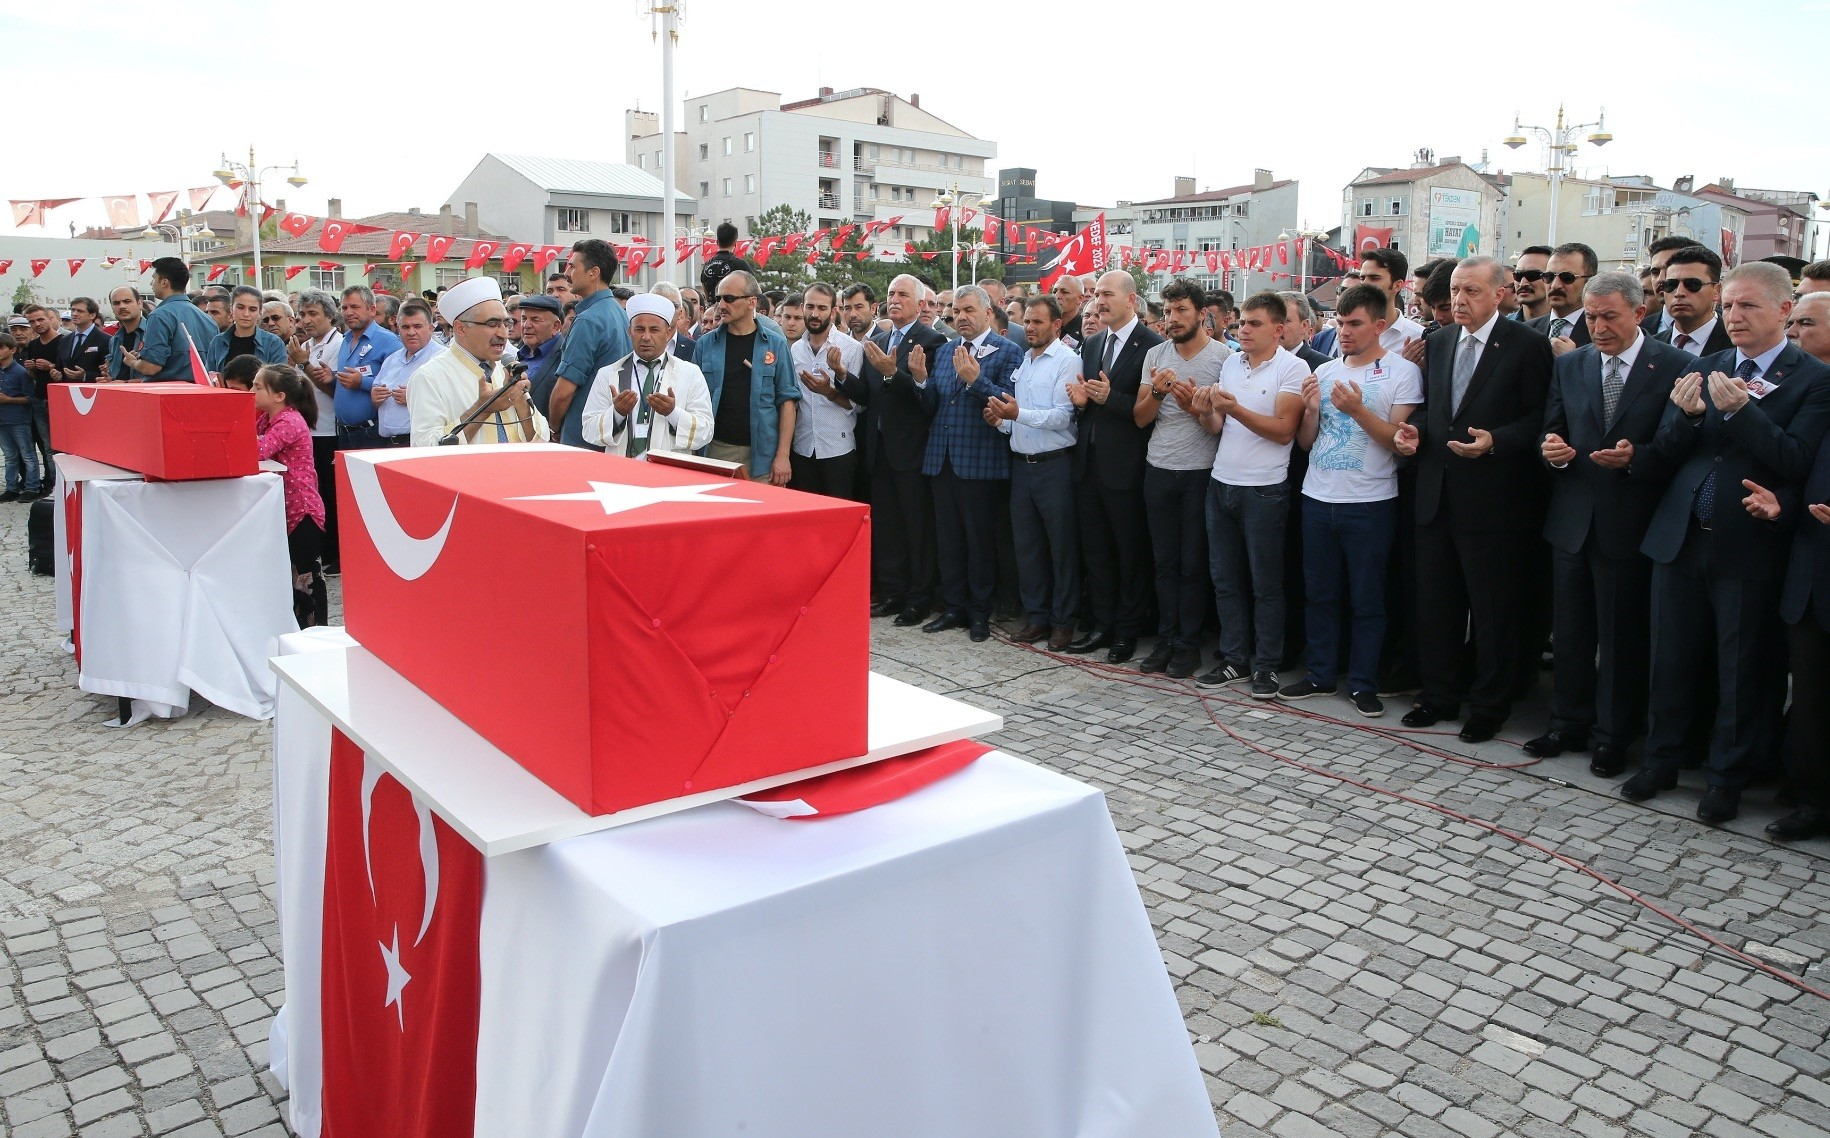 President Recep Tayyip Erdou011fan attends the funeral of Nurcan Karakaya and her 11-month-old son, Mustafa Bedirhan Karakaya, who were killed in a roadside bombing by the PKK in the southeastern province of Hakkari, July 2, 2018.